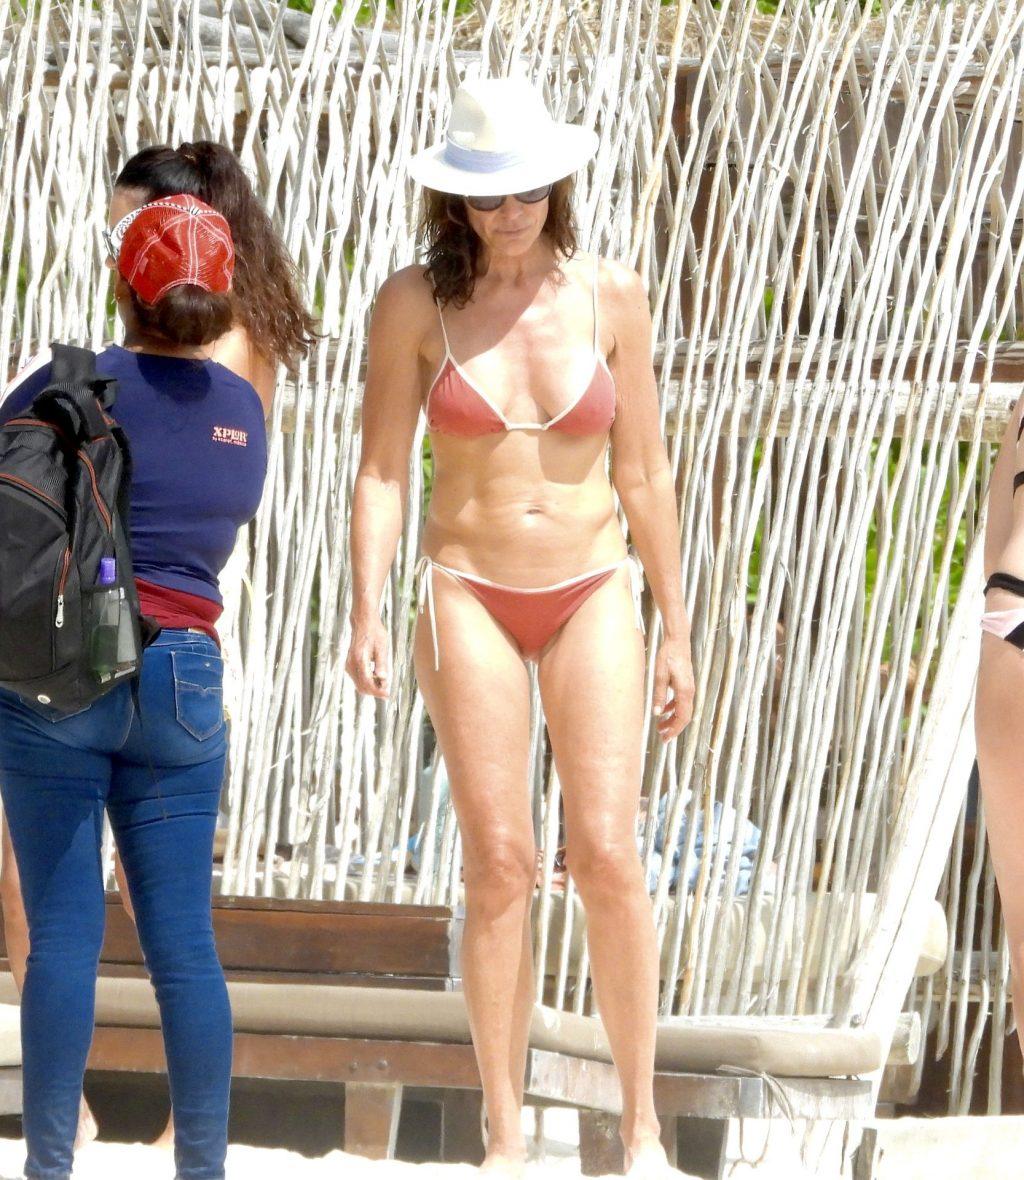 Luann de Lesseps Shows Off Her Bikini Body on the Beach in Mexico (57 Photos)